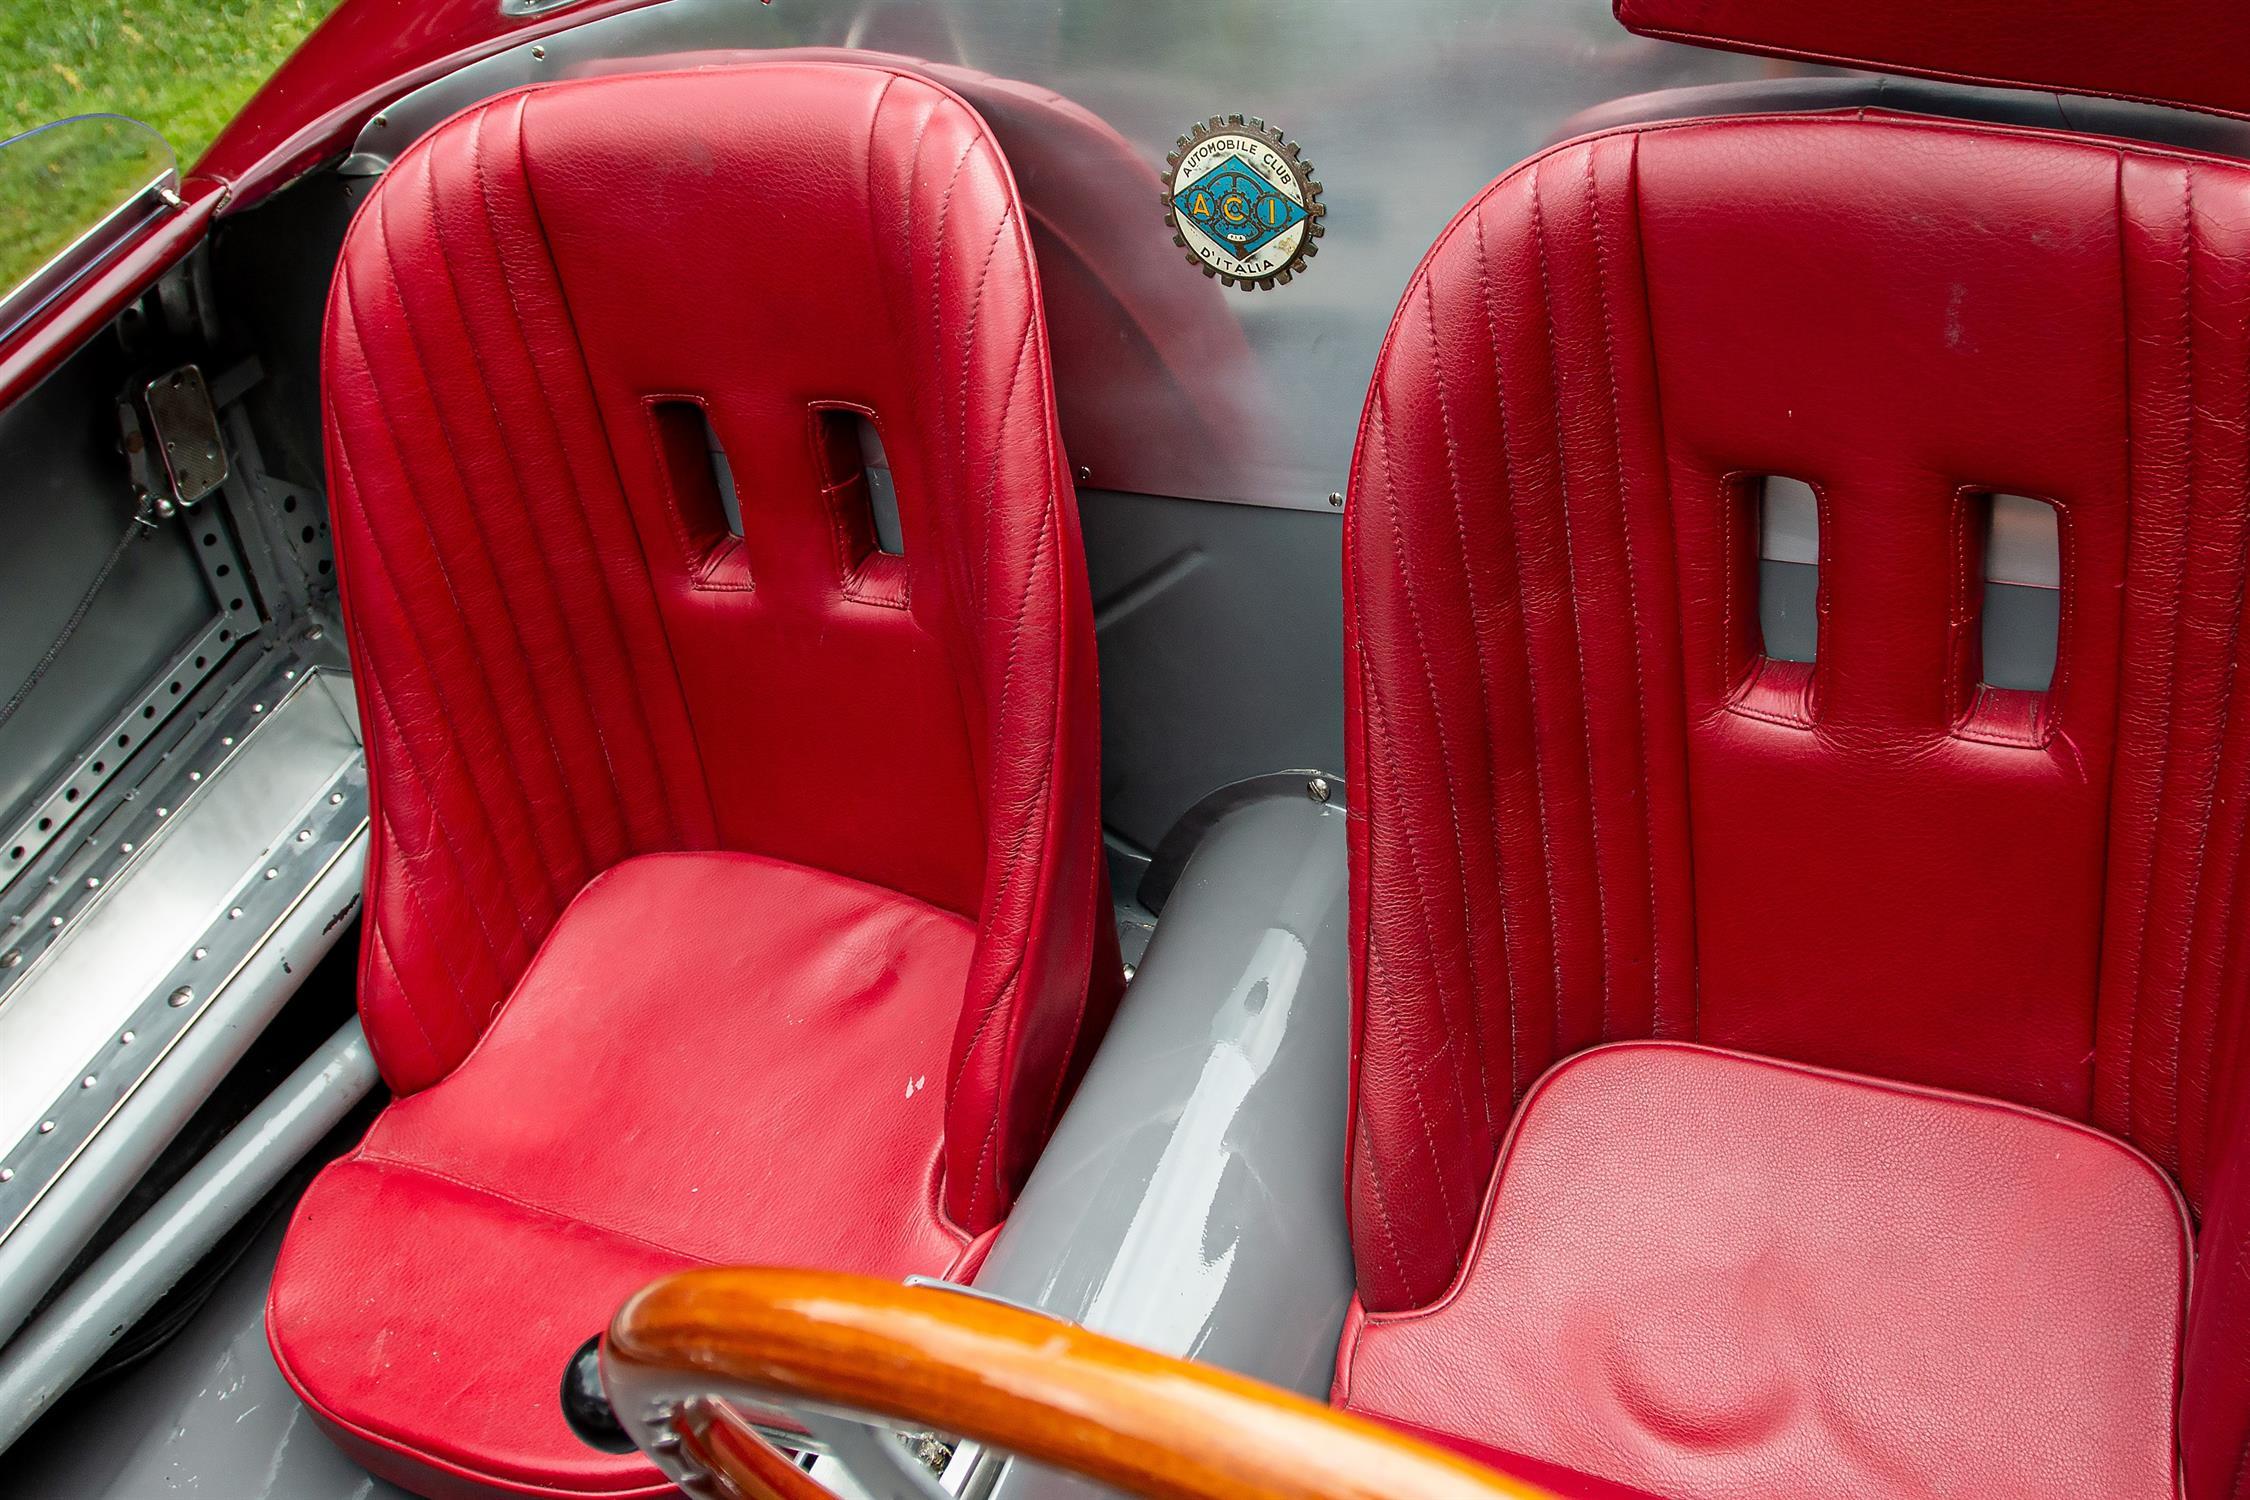 1952 Alfa 1900 ATL Barchetta - Image 5 of 10